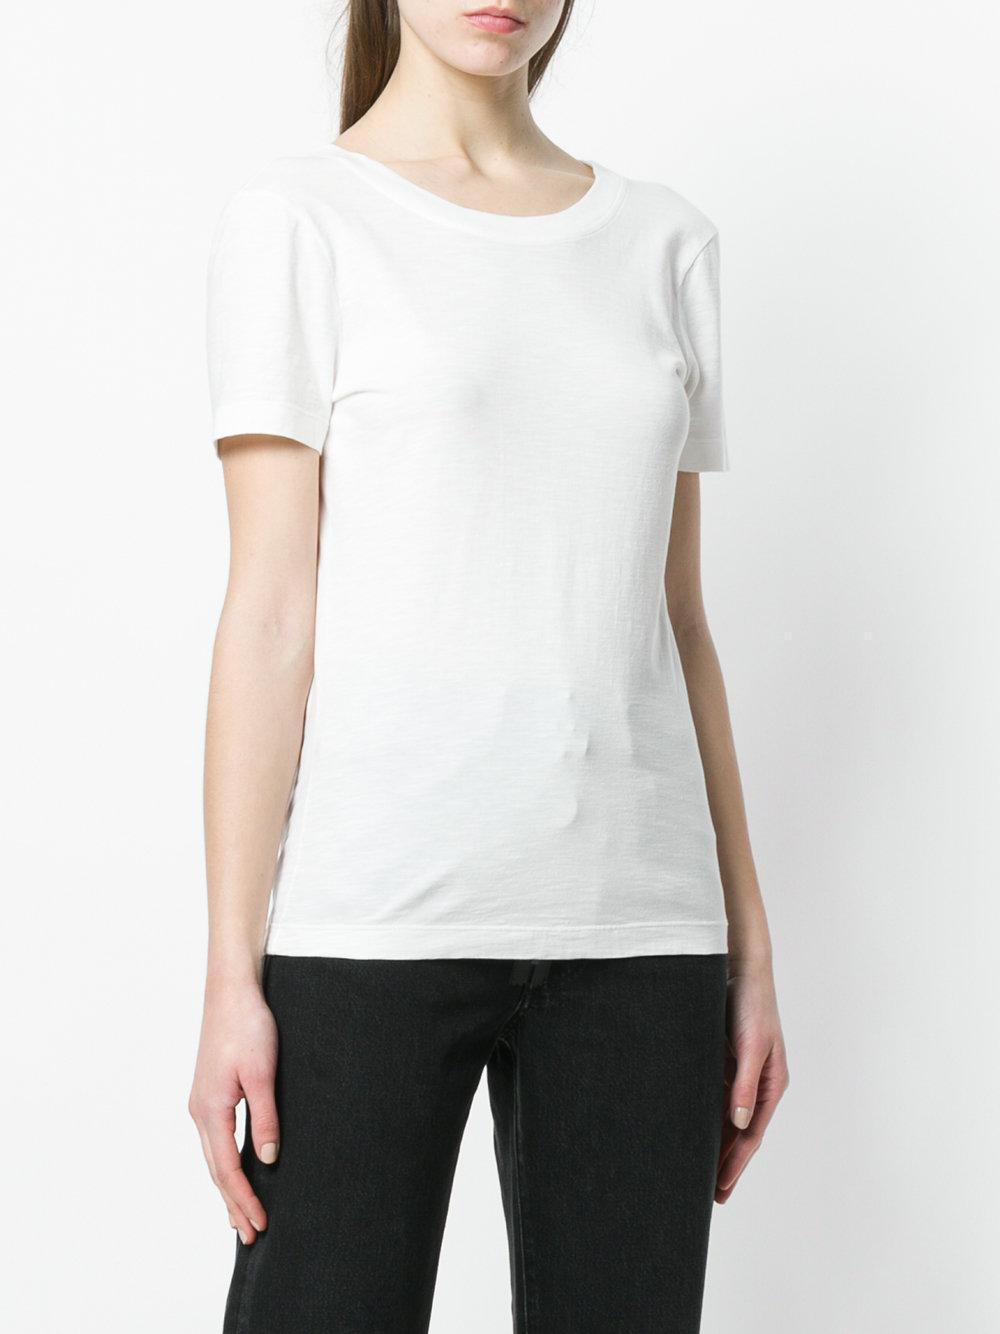 classic shirt - White Maison Martin Margiela Cheap For Nice ZZ1yl